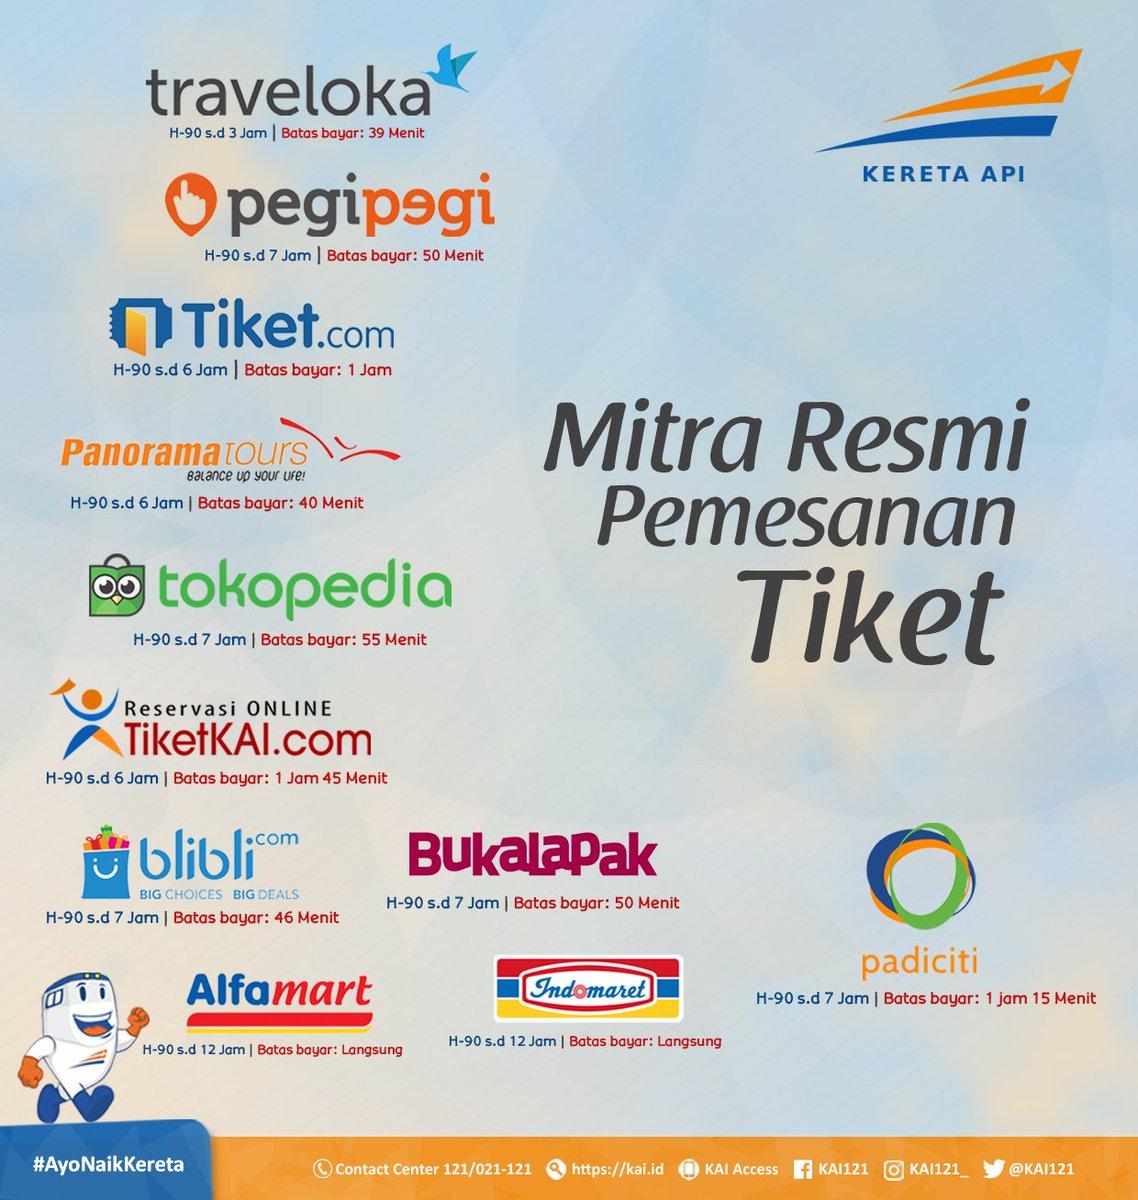 Kereta Api Indonesia On Twitter Beragam Mitra Channel Resmi Kami